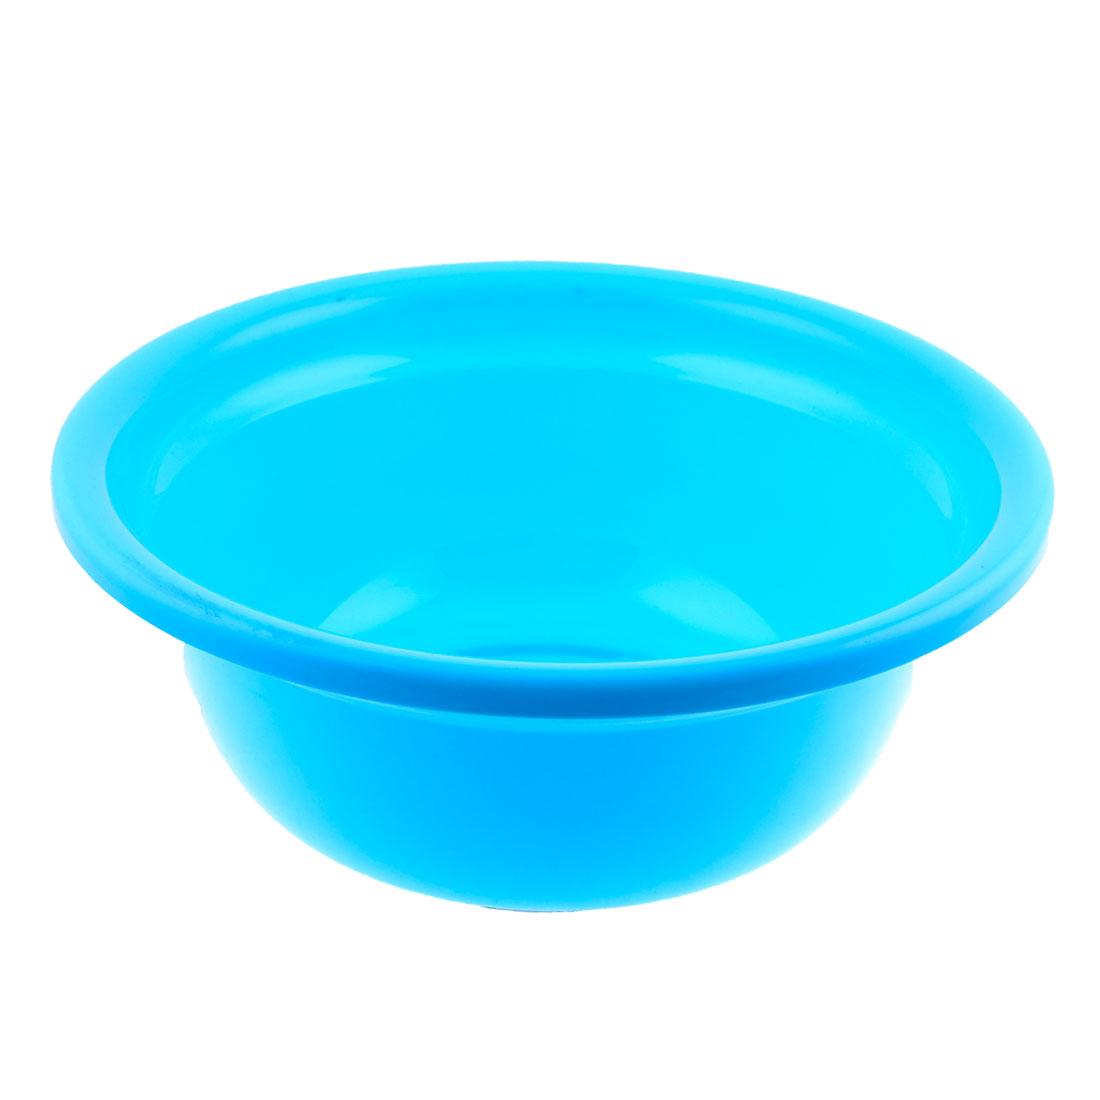 "Family Kitchen Blue Round Plastic Anti Slip Washing up Bowl 12.2"" Dia"